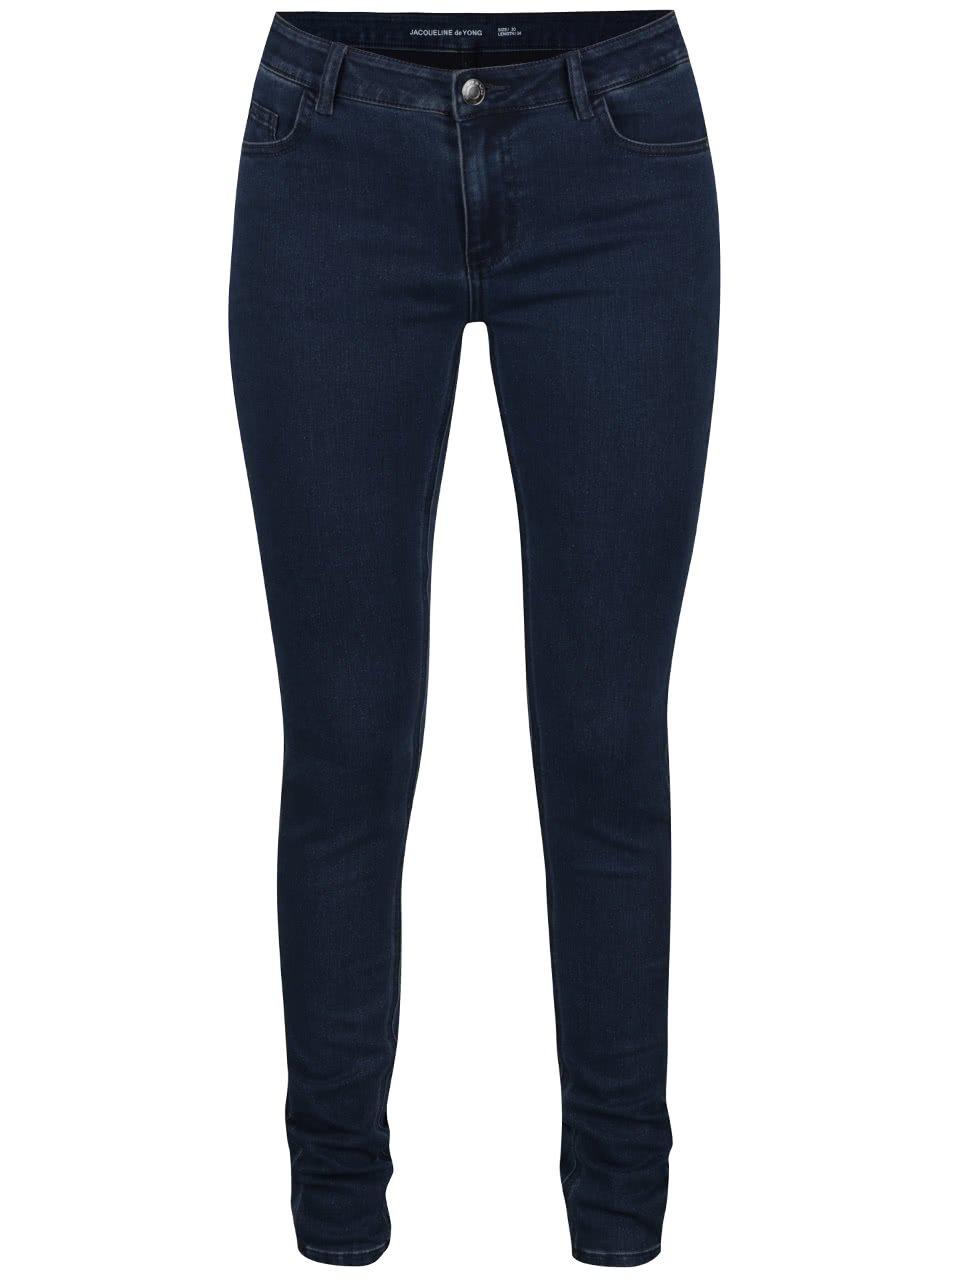 Tmavě modré džíny Jacqueline de Yong Low Holly